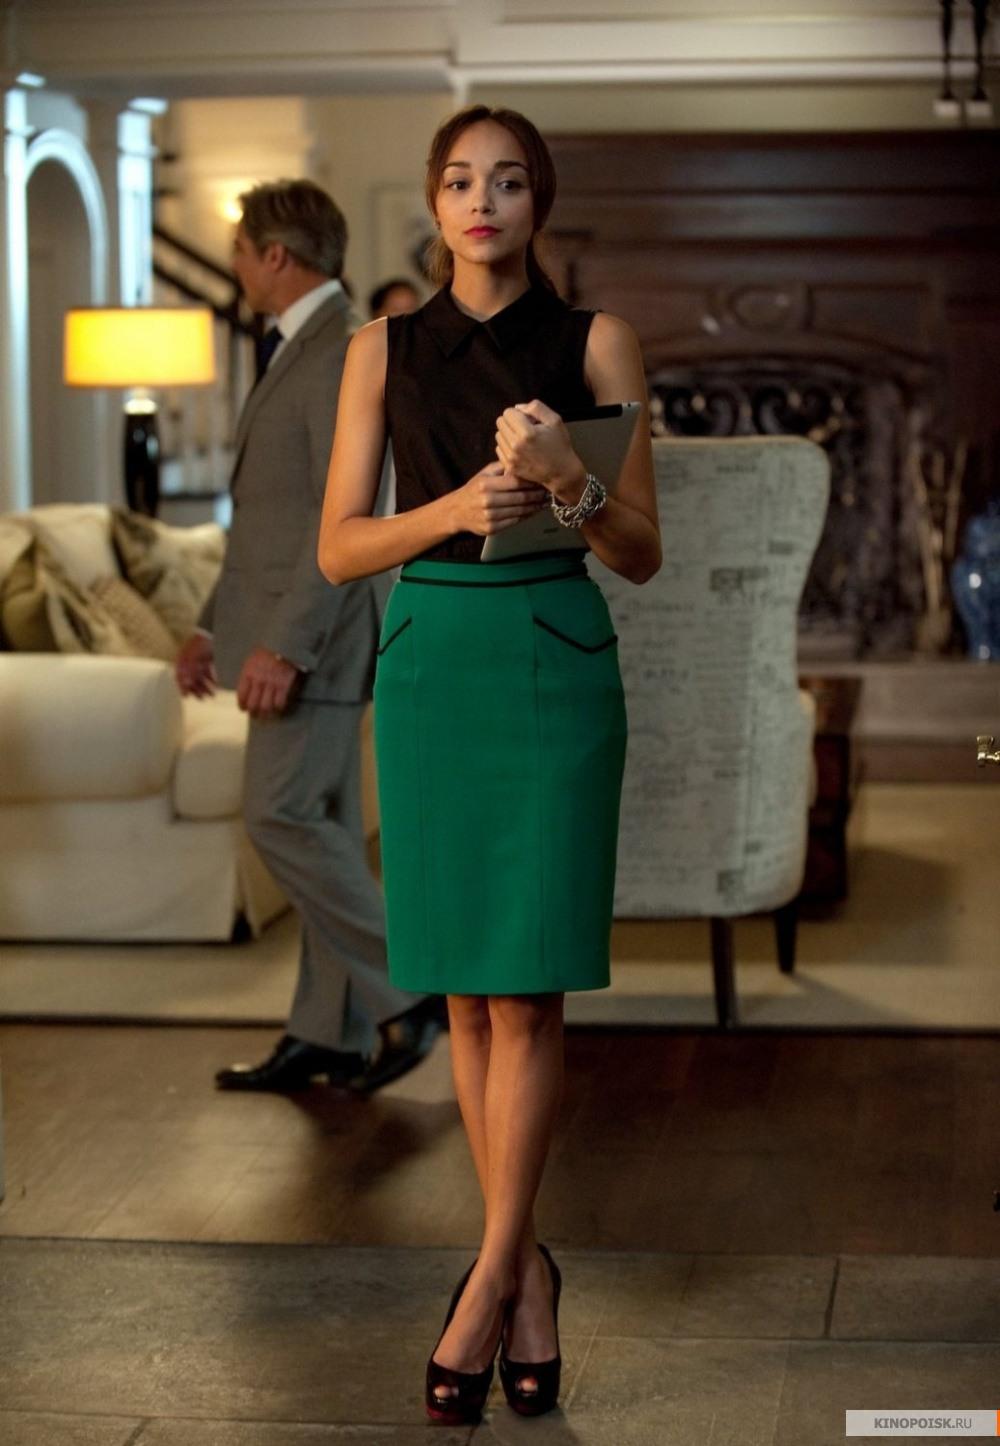 Ashley davenport fashion blog 22